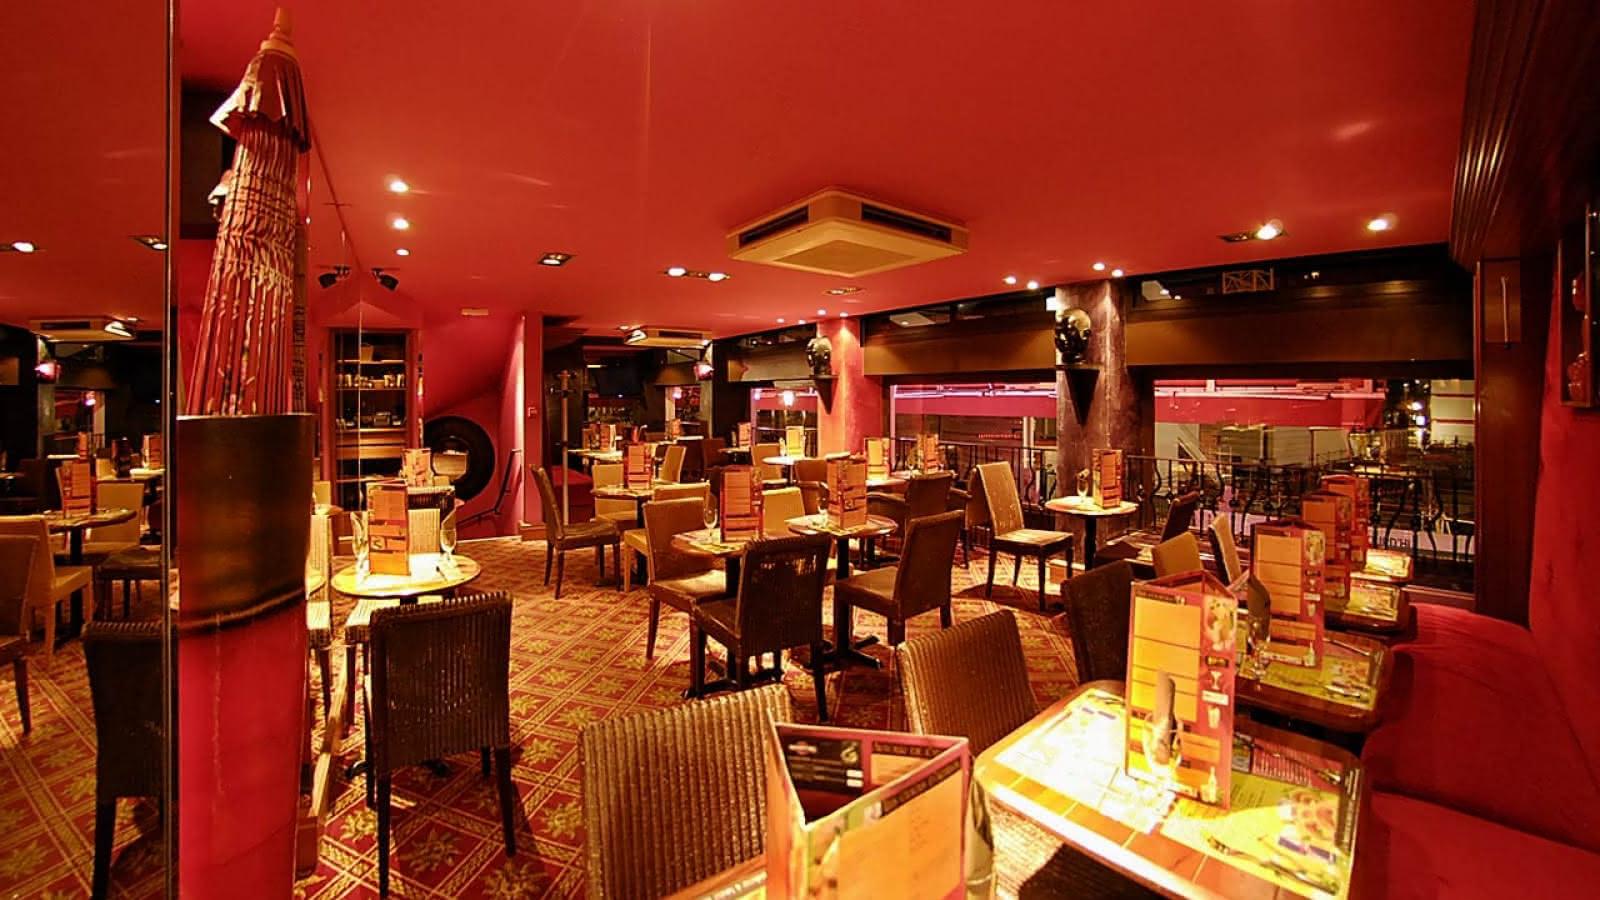 © Salle - Restaurant -Garden Ice Café